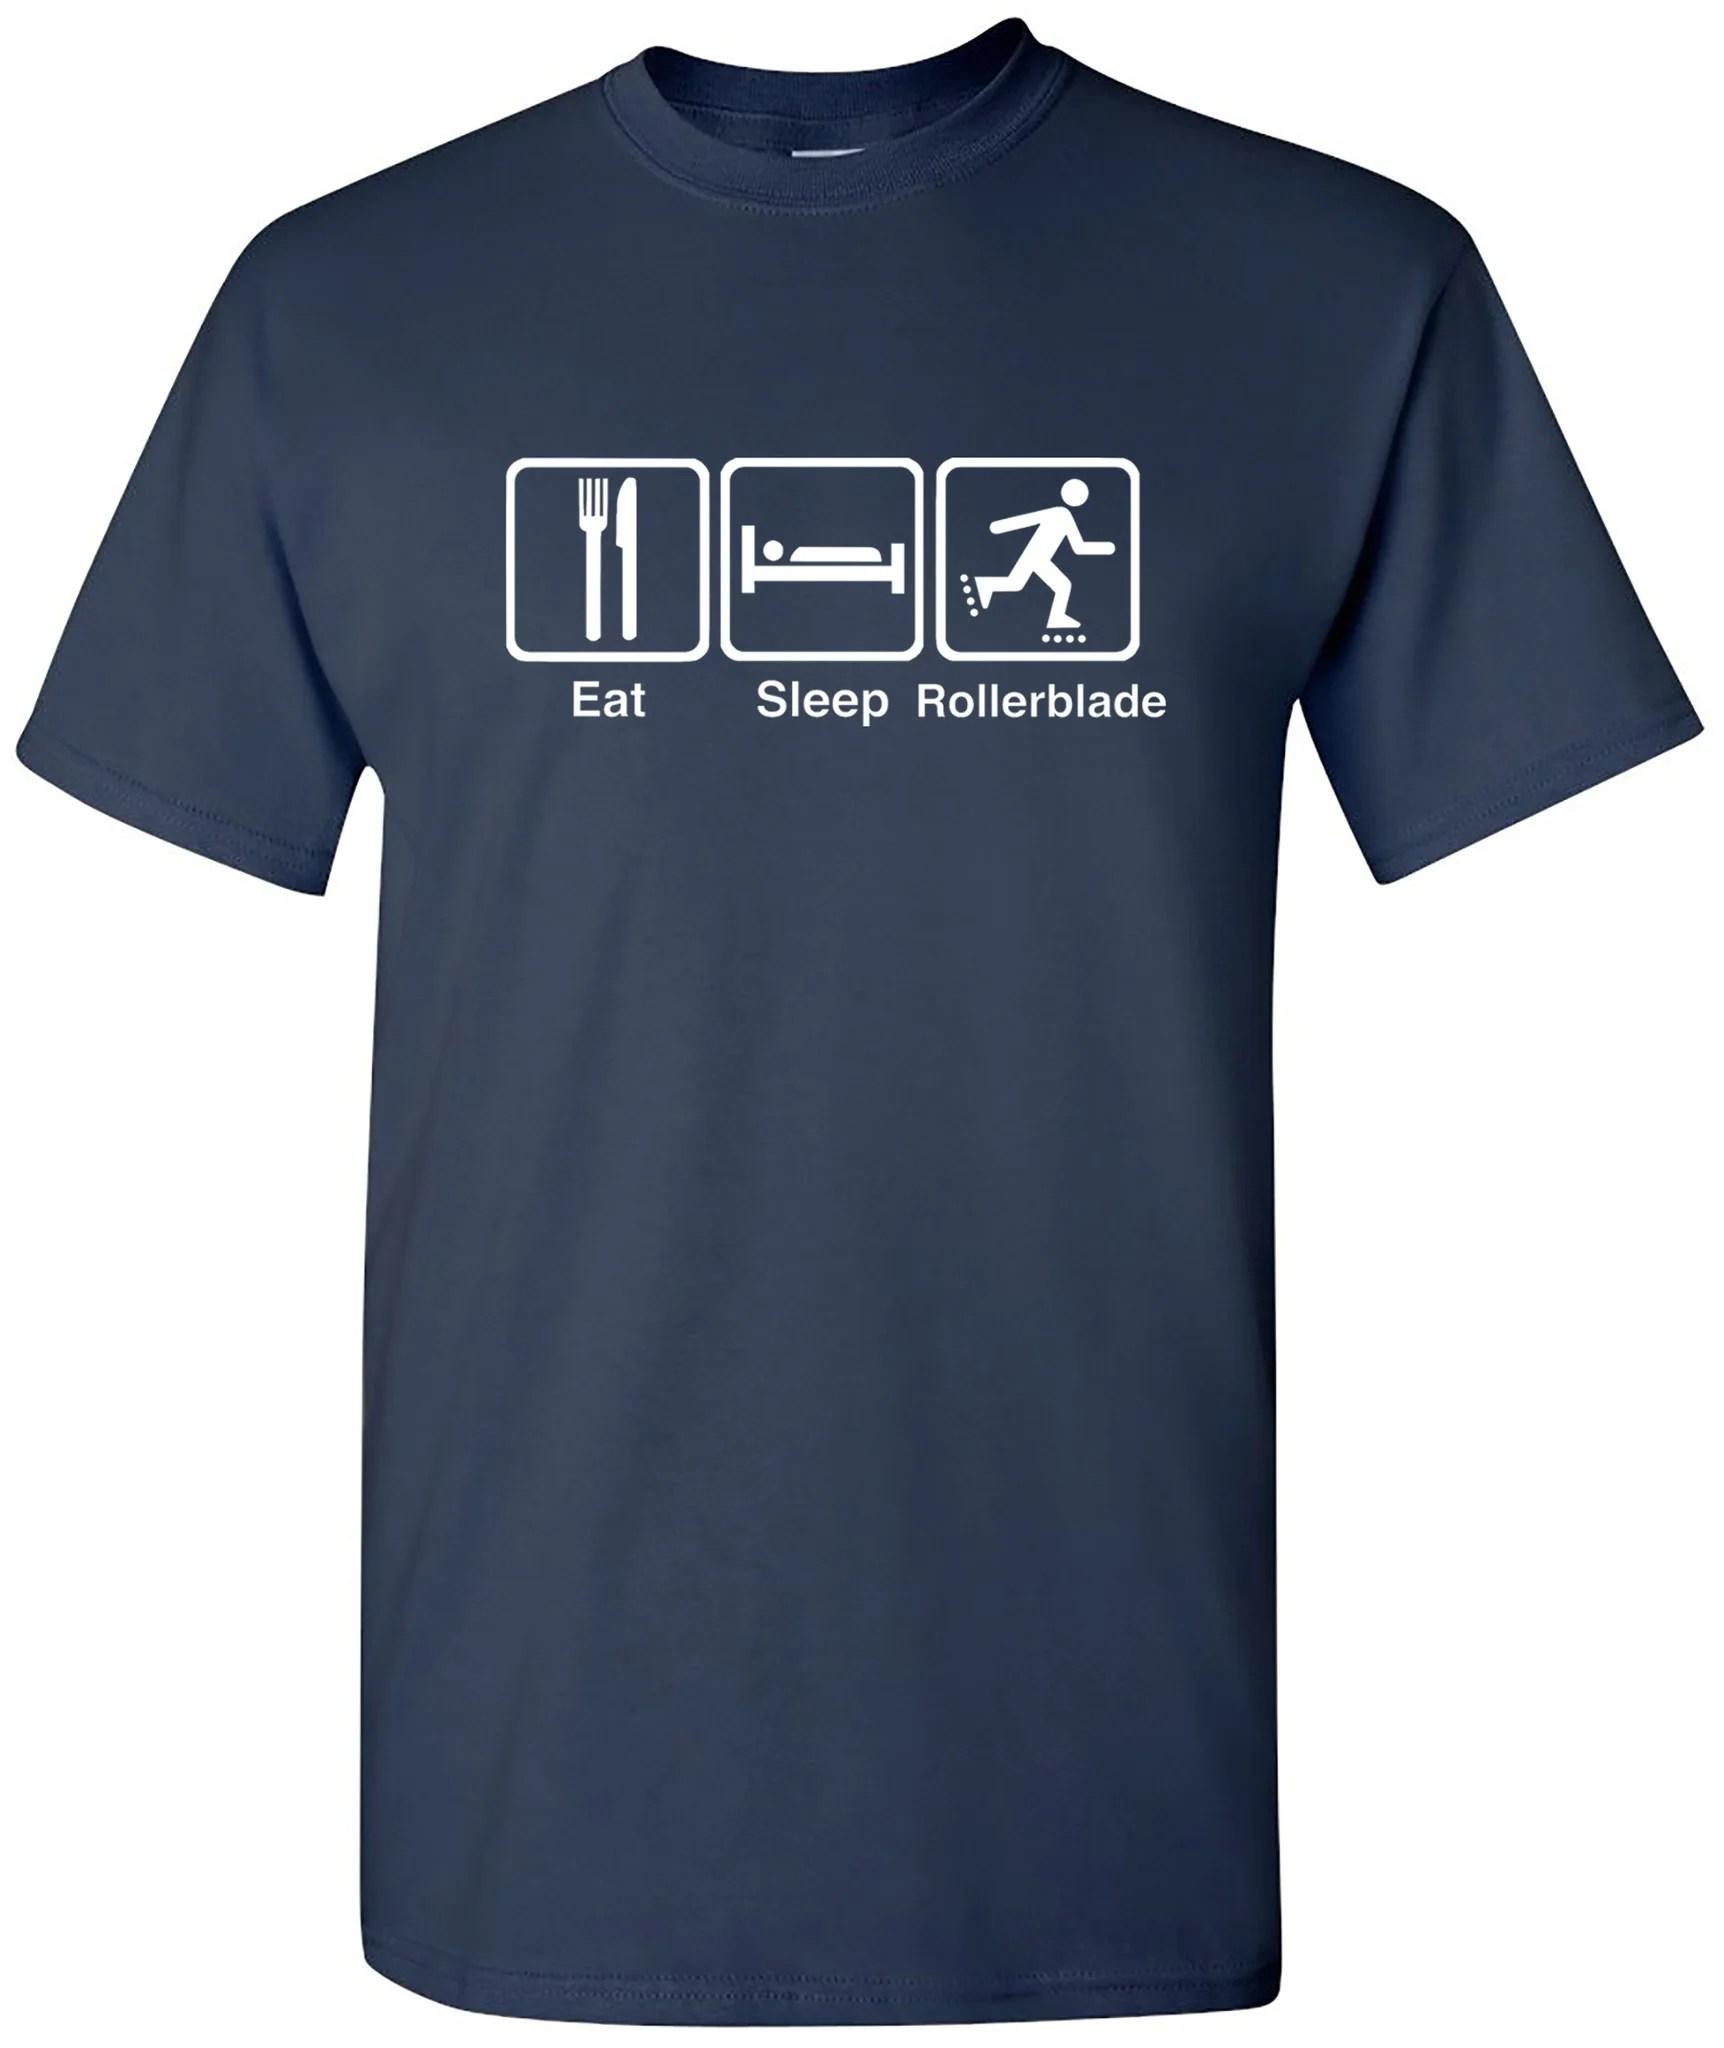 Eat sleep rollerblade t shirt with skating rollerblading tee